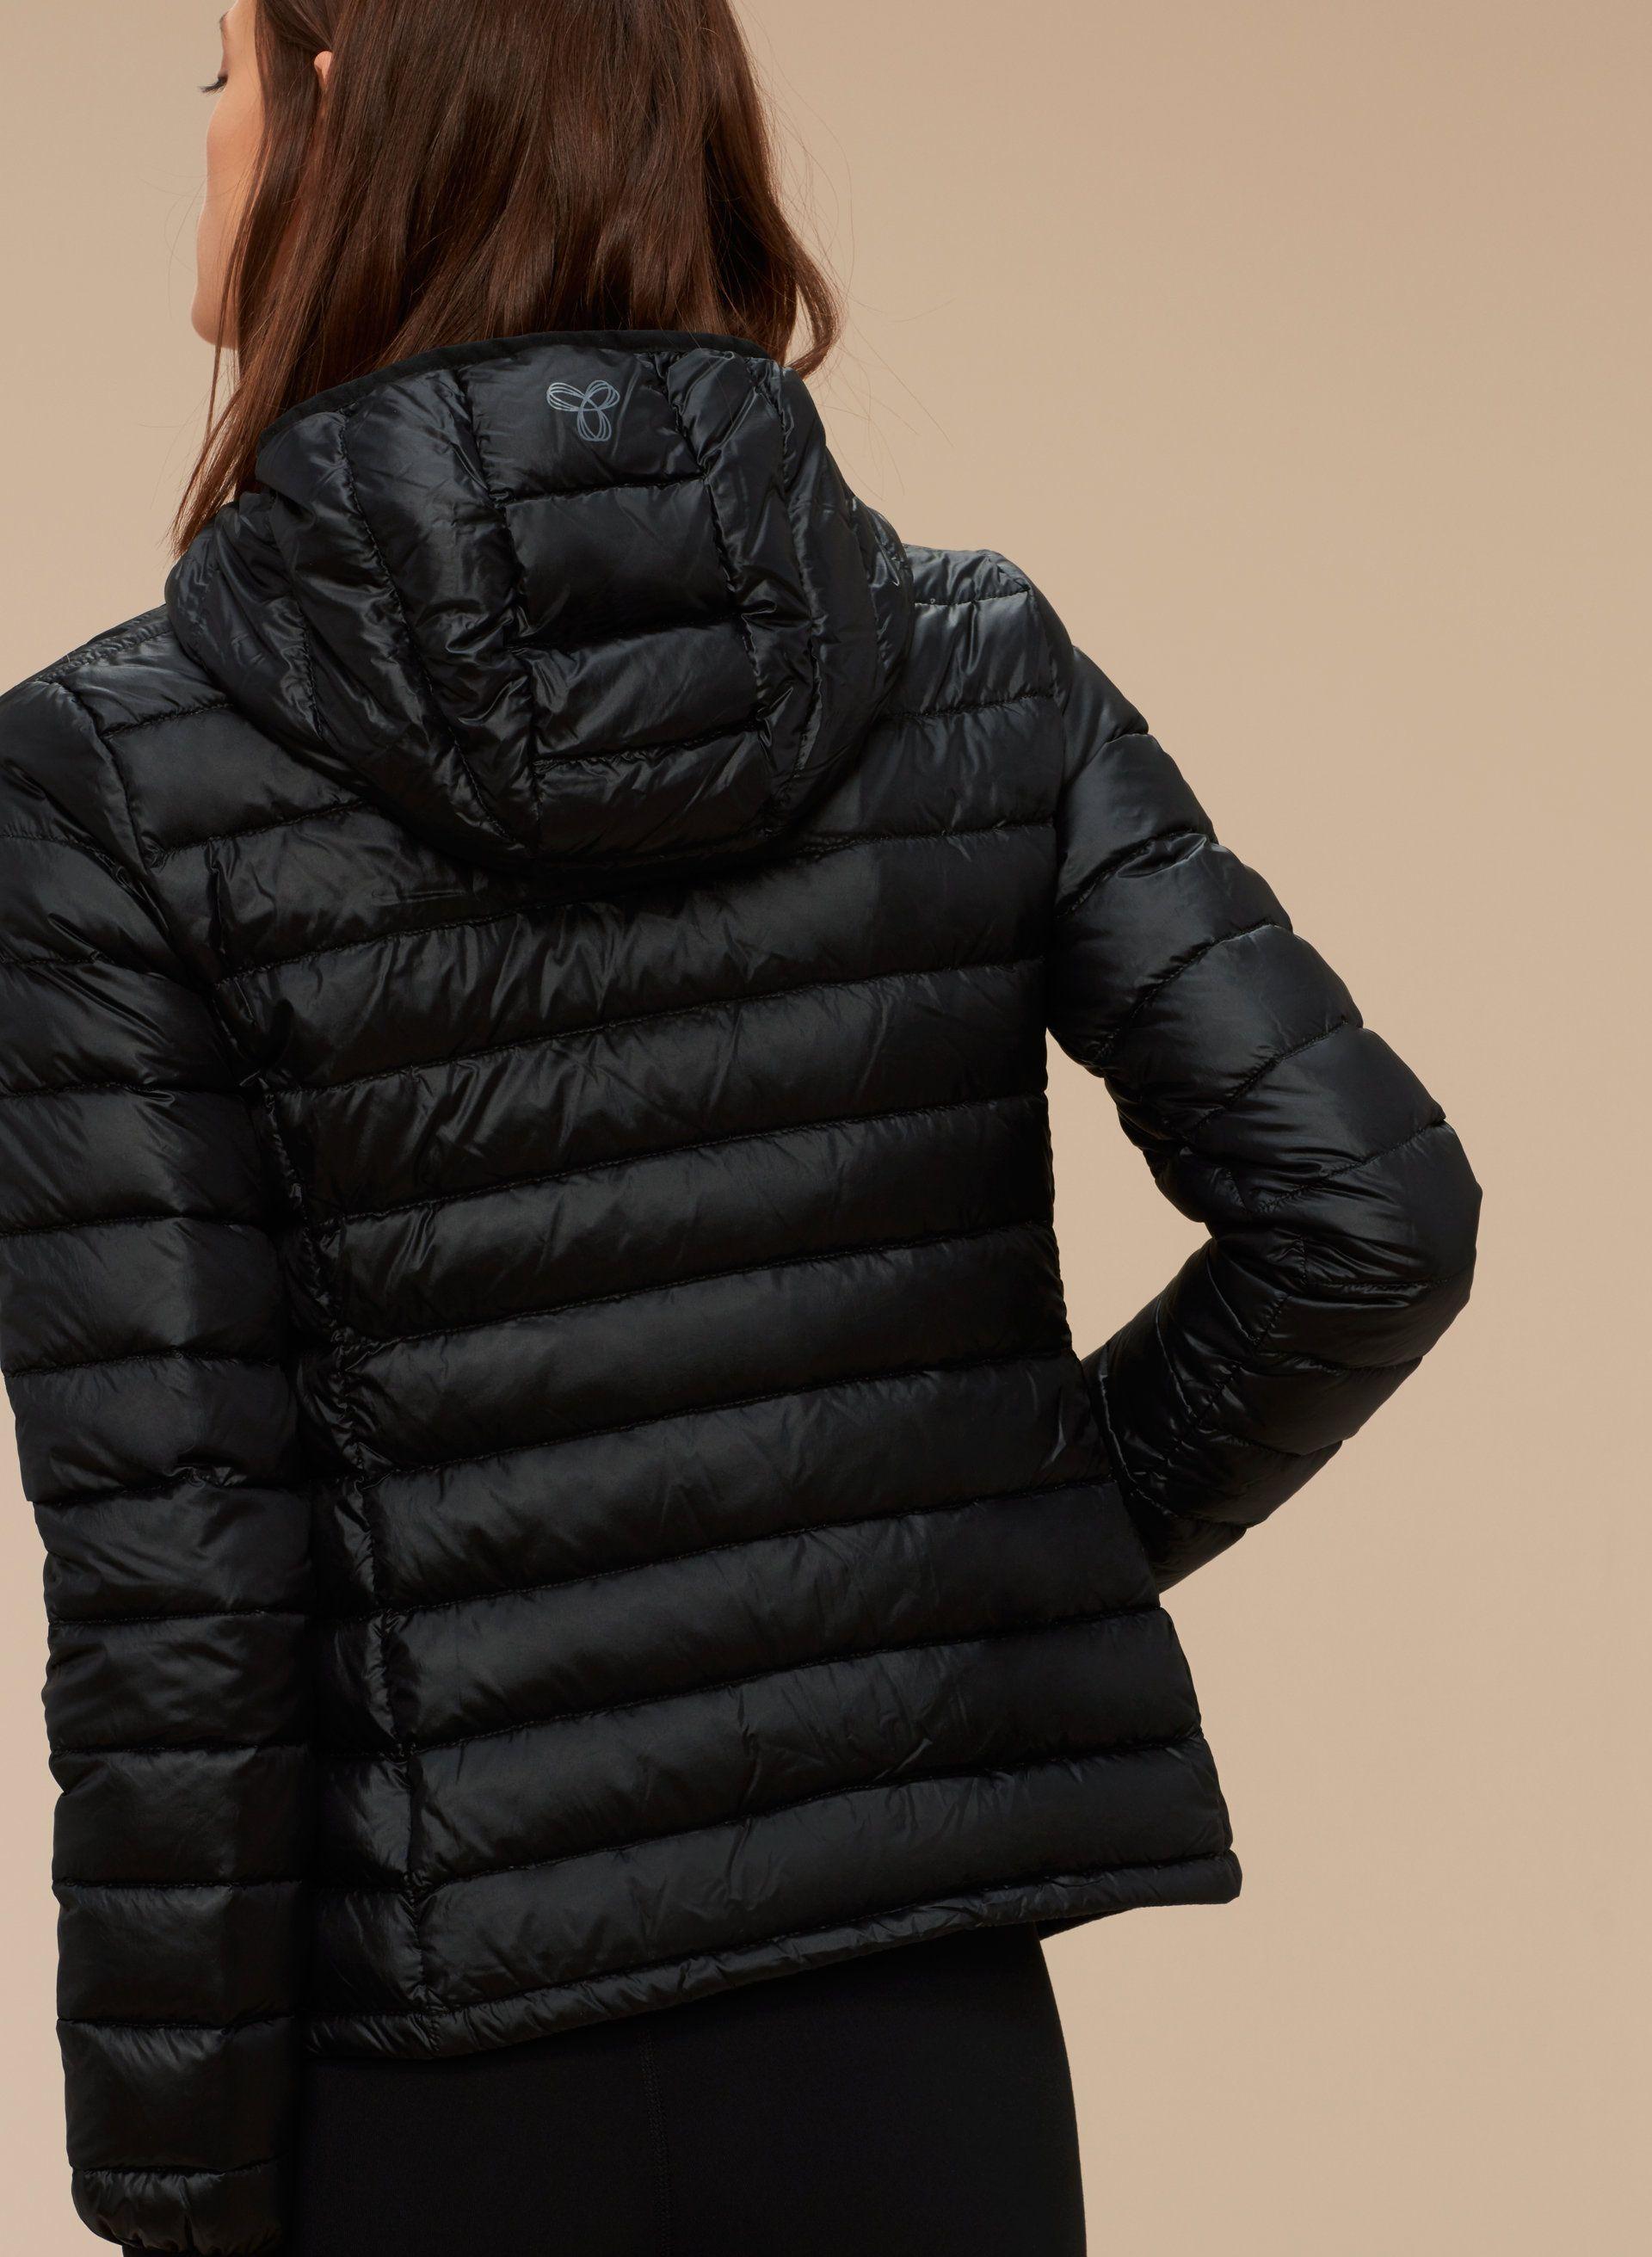 Tna Botanie Jacket Aritzia Jacket Outfit Women Bubble Jacket Outfit Puffer Jacket Women [ 2623 x 1920 Pixel ]